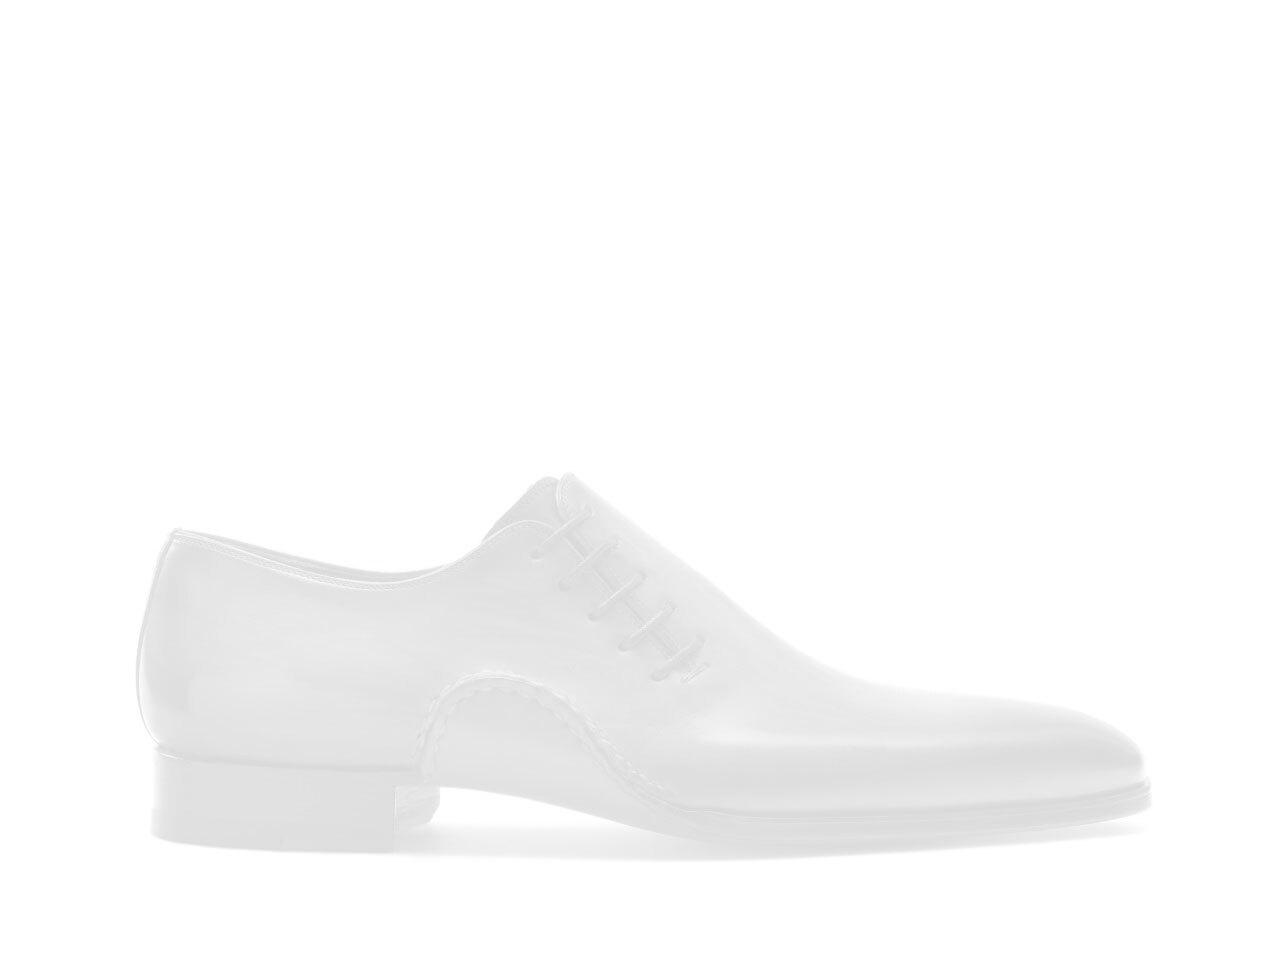 Pair of the Magnanni Nico Midbrown Men's Sneakers